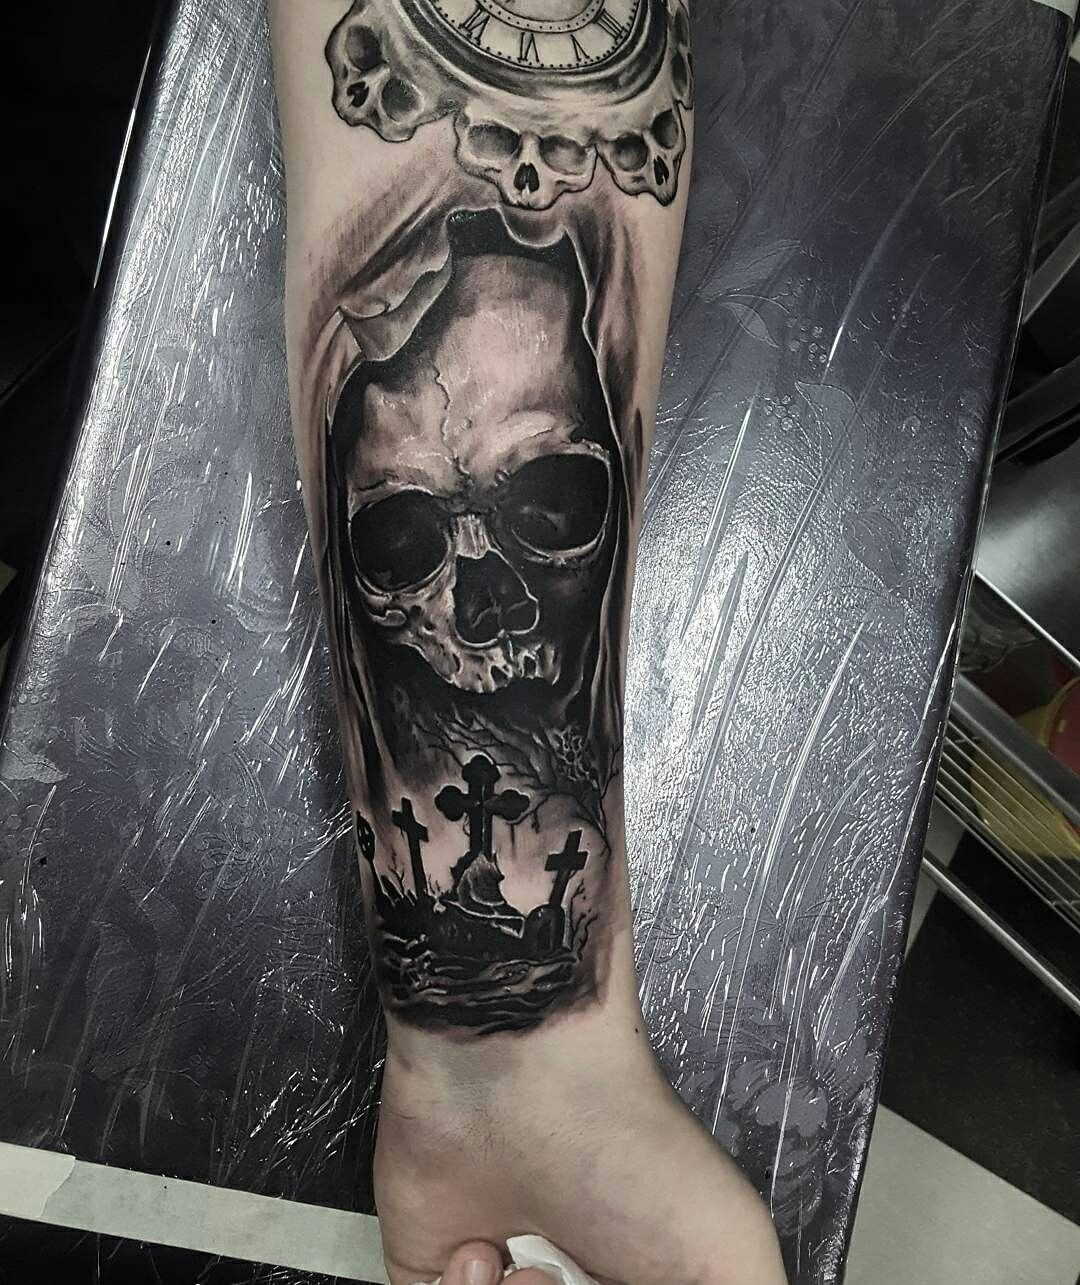 Skull Tattoo Arrethai Skull Sleeve Tattoos Cool Tattoos For Guys Evil Tattoos